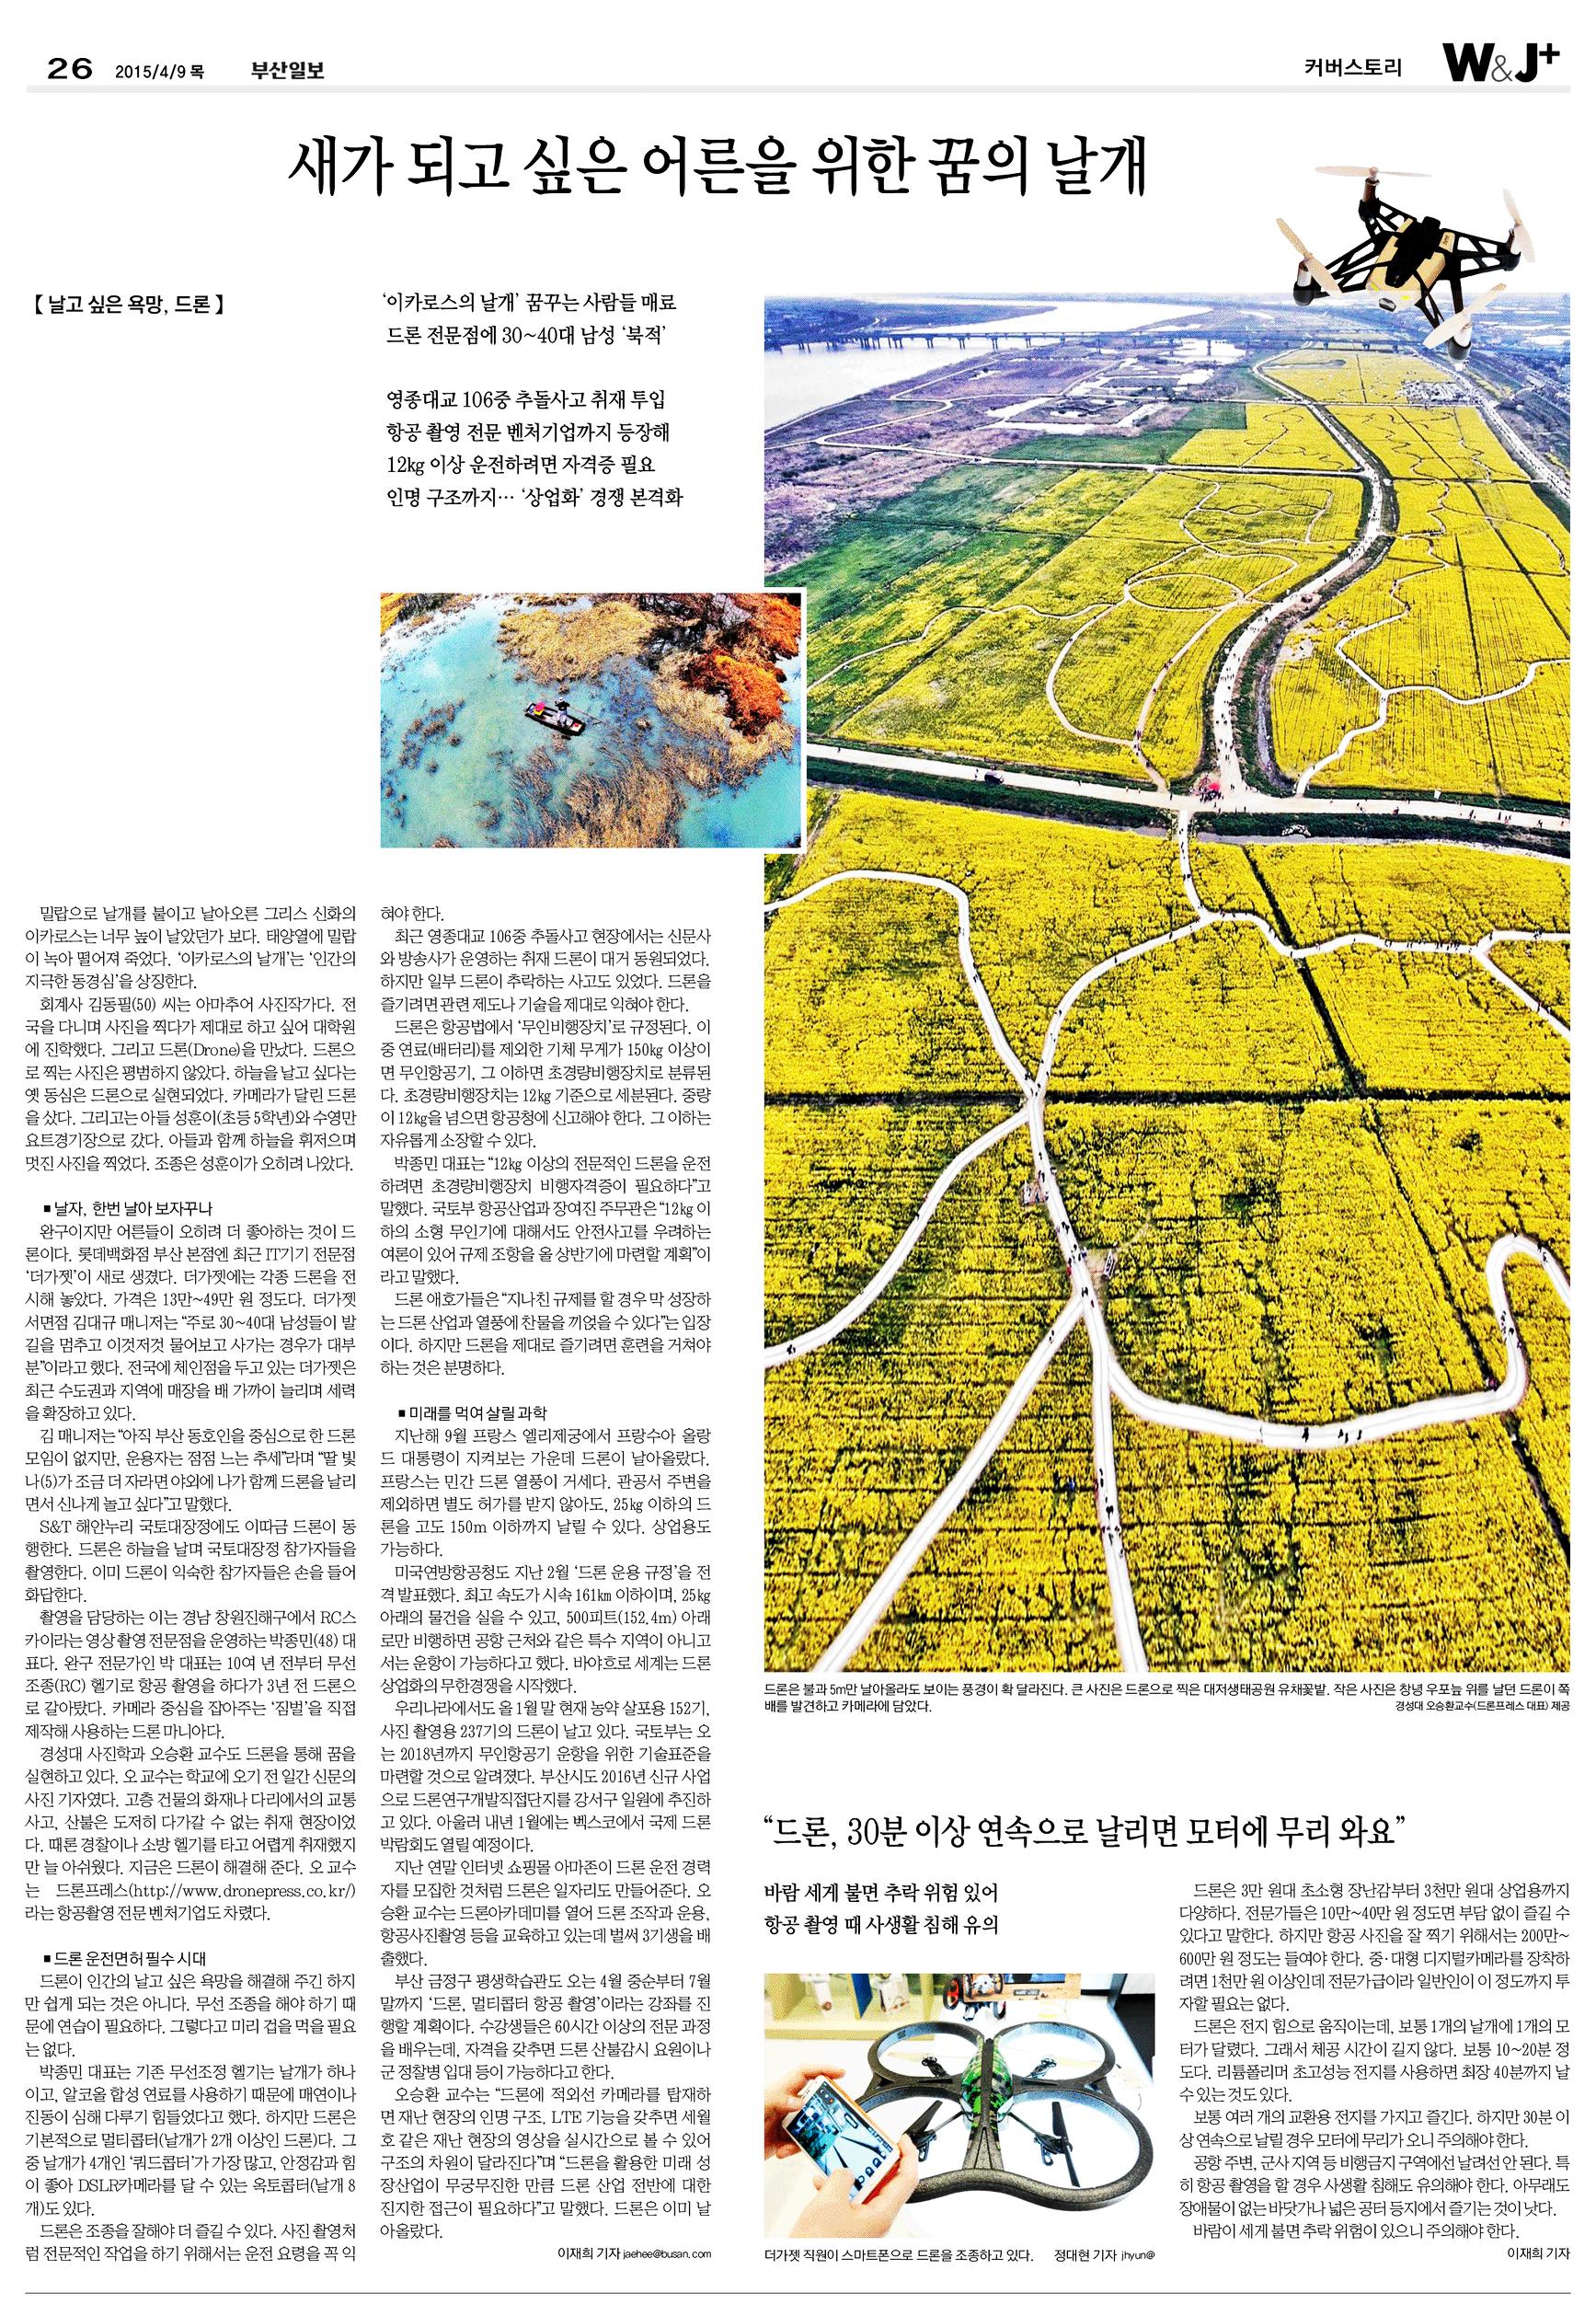 Thu Apr 9 2015 - 26면